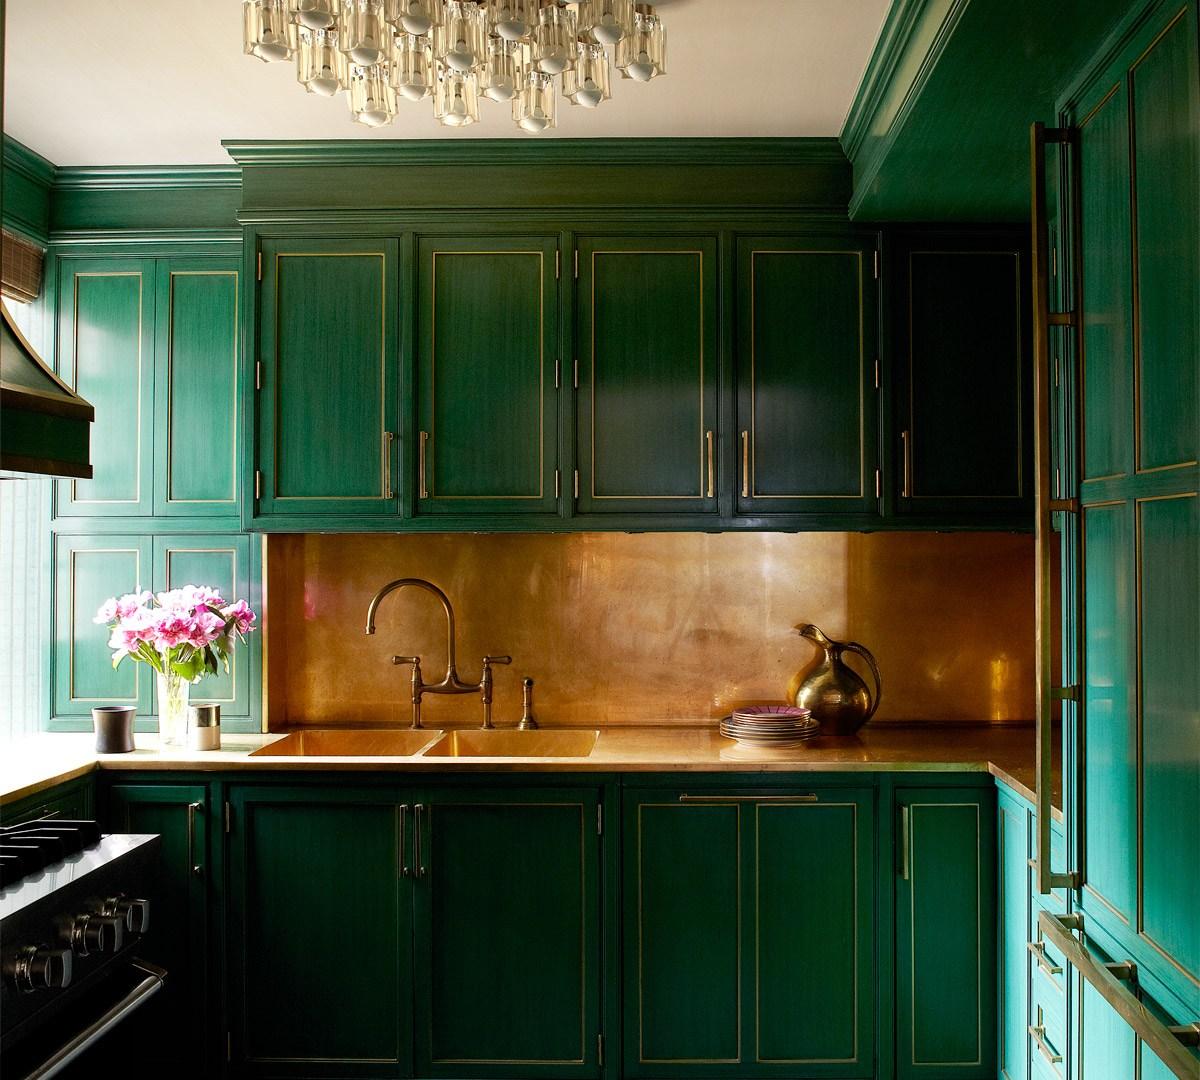 Brass Kitchens, Brass Bathrooms, Brass Fixtures, Oh My!